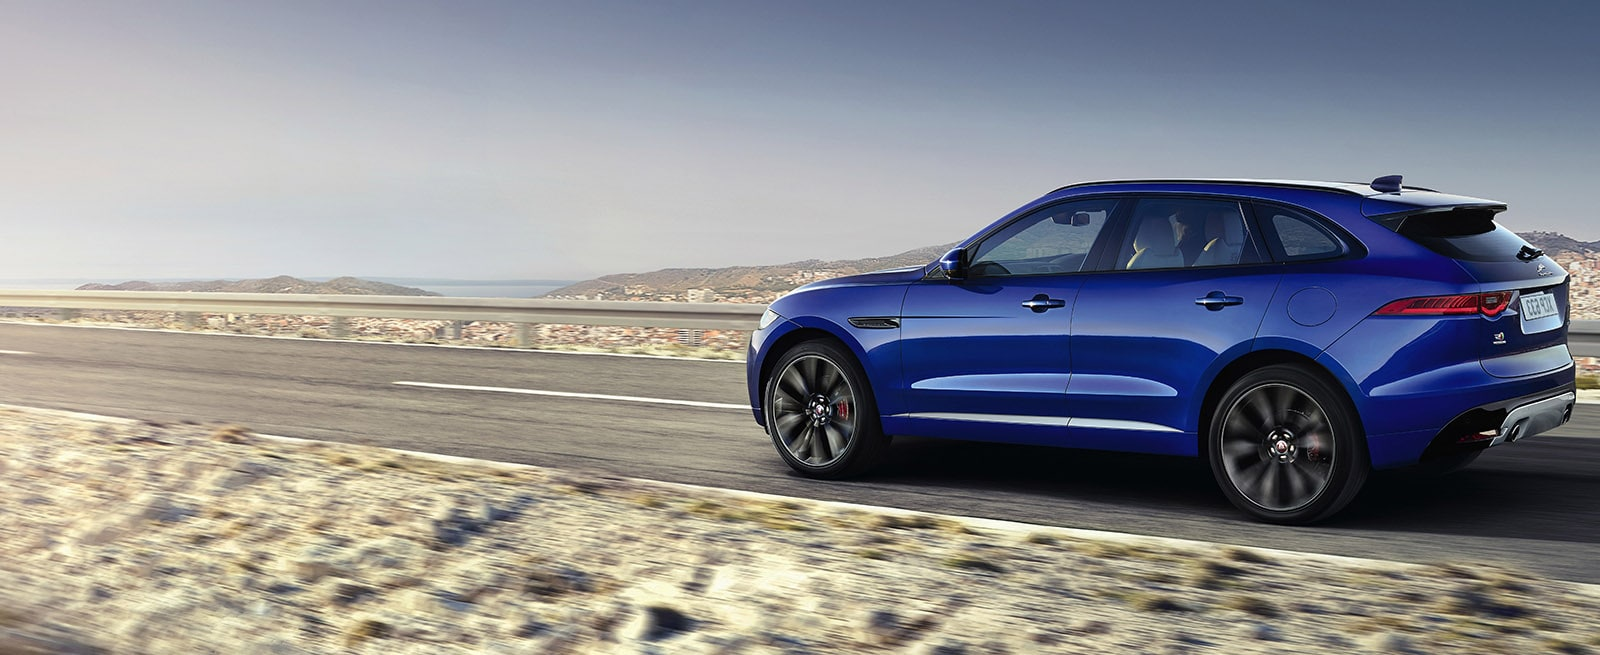 Blue Jaguar F-Pace Driving Along A Desert Road